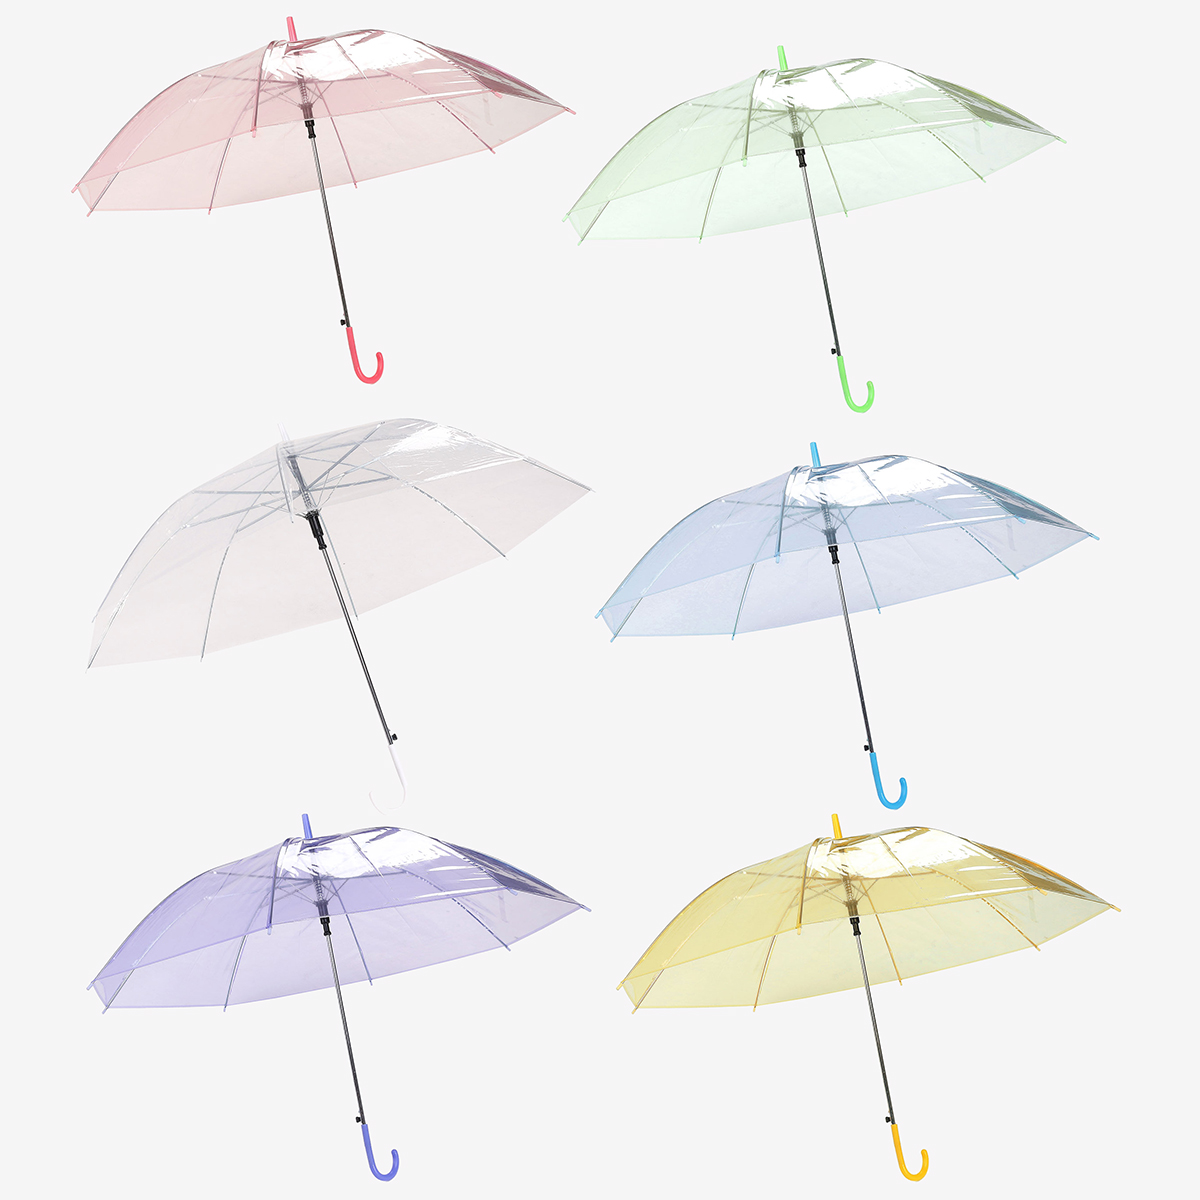 Colorful Transparent Automatic Rain Umbrella Dome Wedding Party Favor Waterproof Umbrella